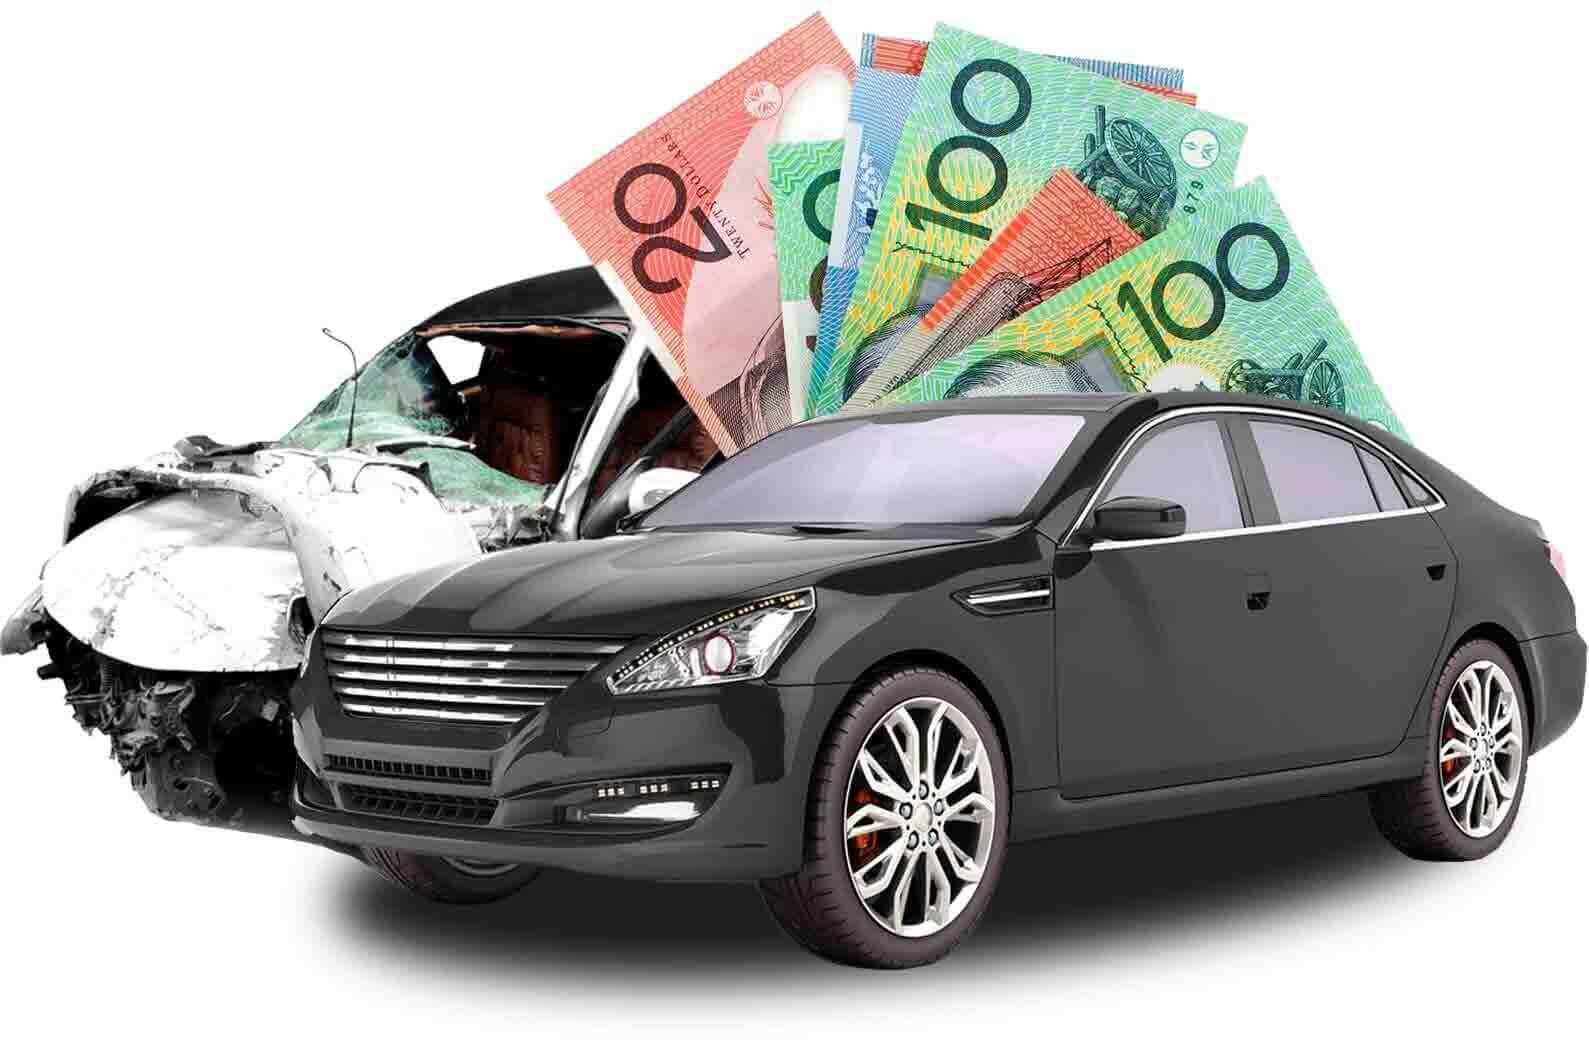 Top cash for scrap cars sydney